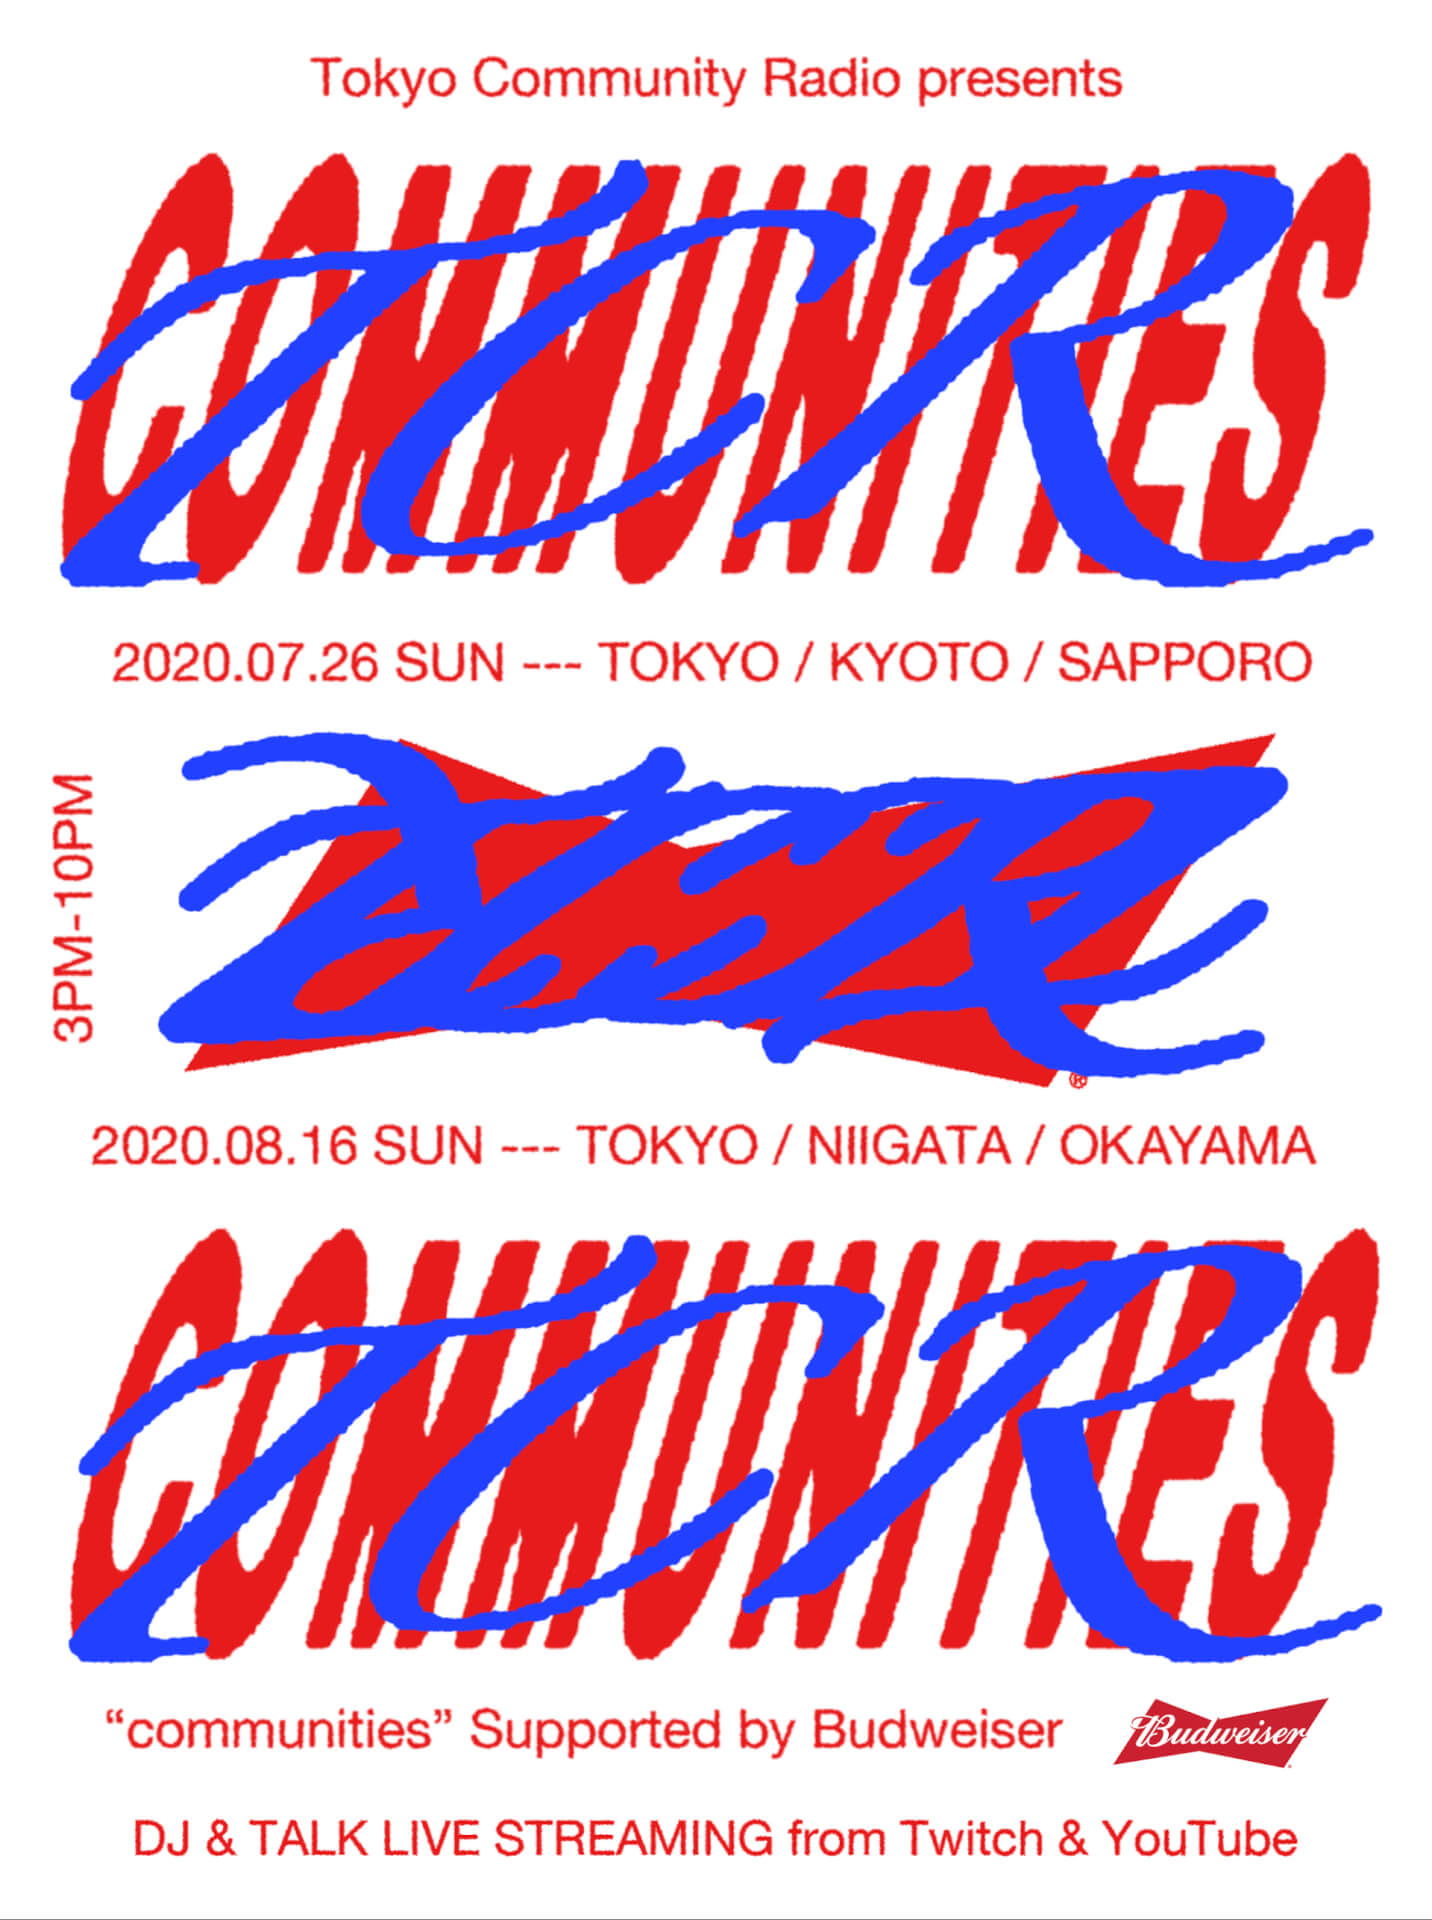 BIMのBLITZライブ配信&Tokyo Community Radioの DJ配信をバドワイザー「RE:CONNECT」が支援決定! music200709_reconnect_4